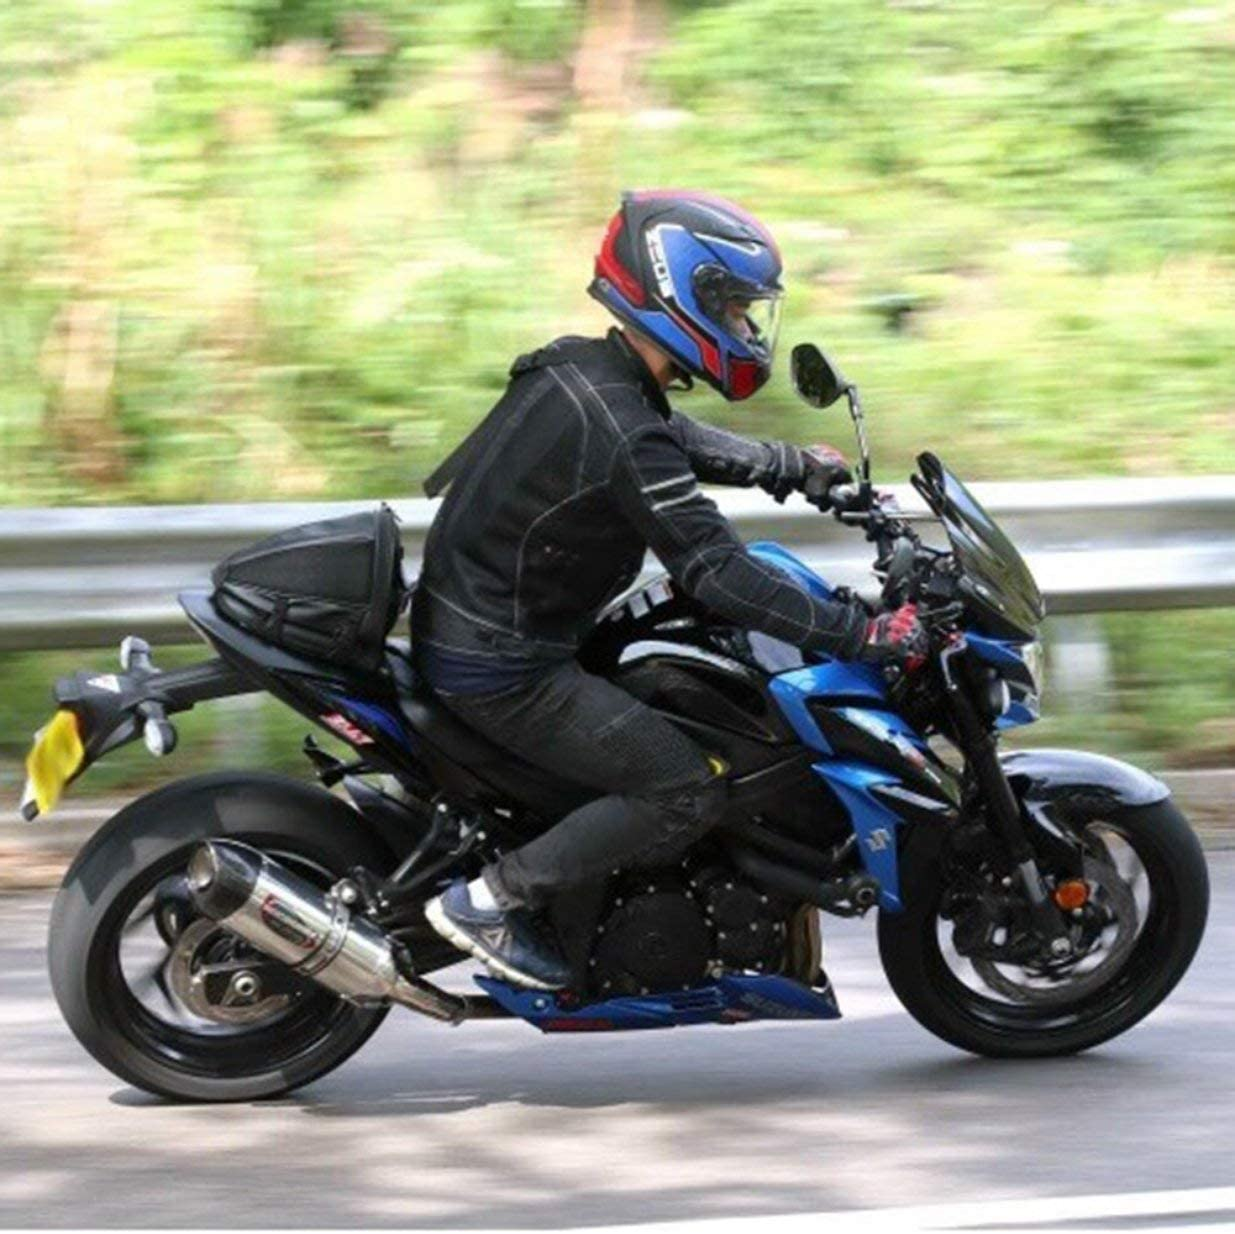 Sairis Motor Alforja Bolsa de Cola Bolsa Trasera Trasera Asiento Bolsa de Transporte Deportiva Impermeable Moto Bici Equipaje Alforja